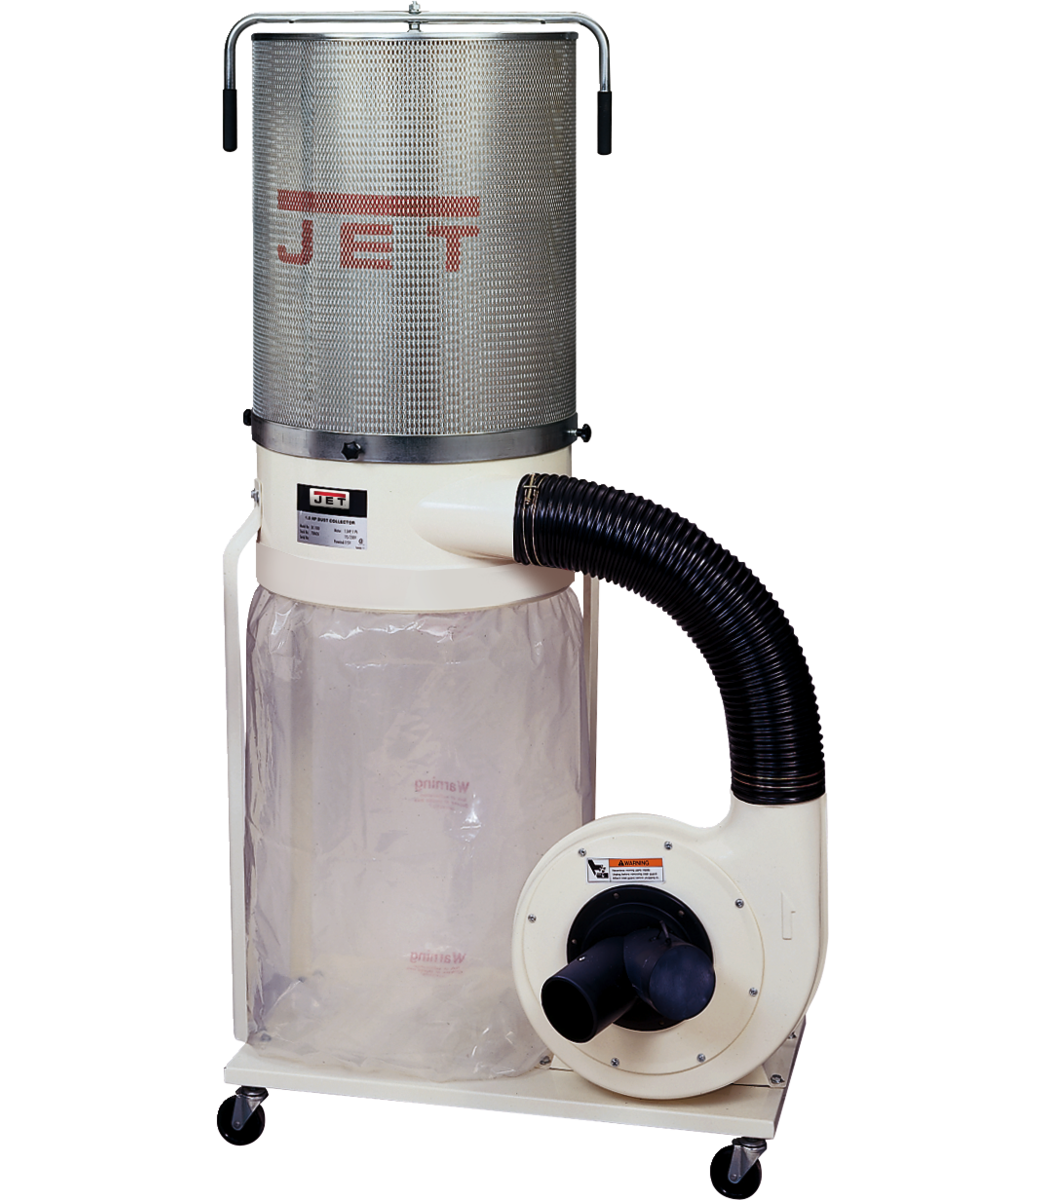 DC-1100VX-CK, Recolector de polvo de 1.5 HP monofásico de 115/230 V, kit de cilindro de filtración de 2 micras